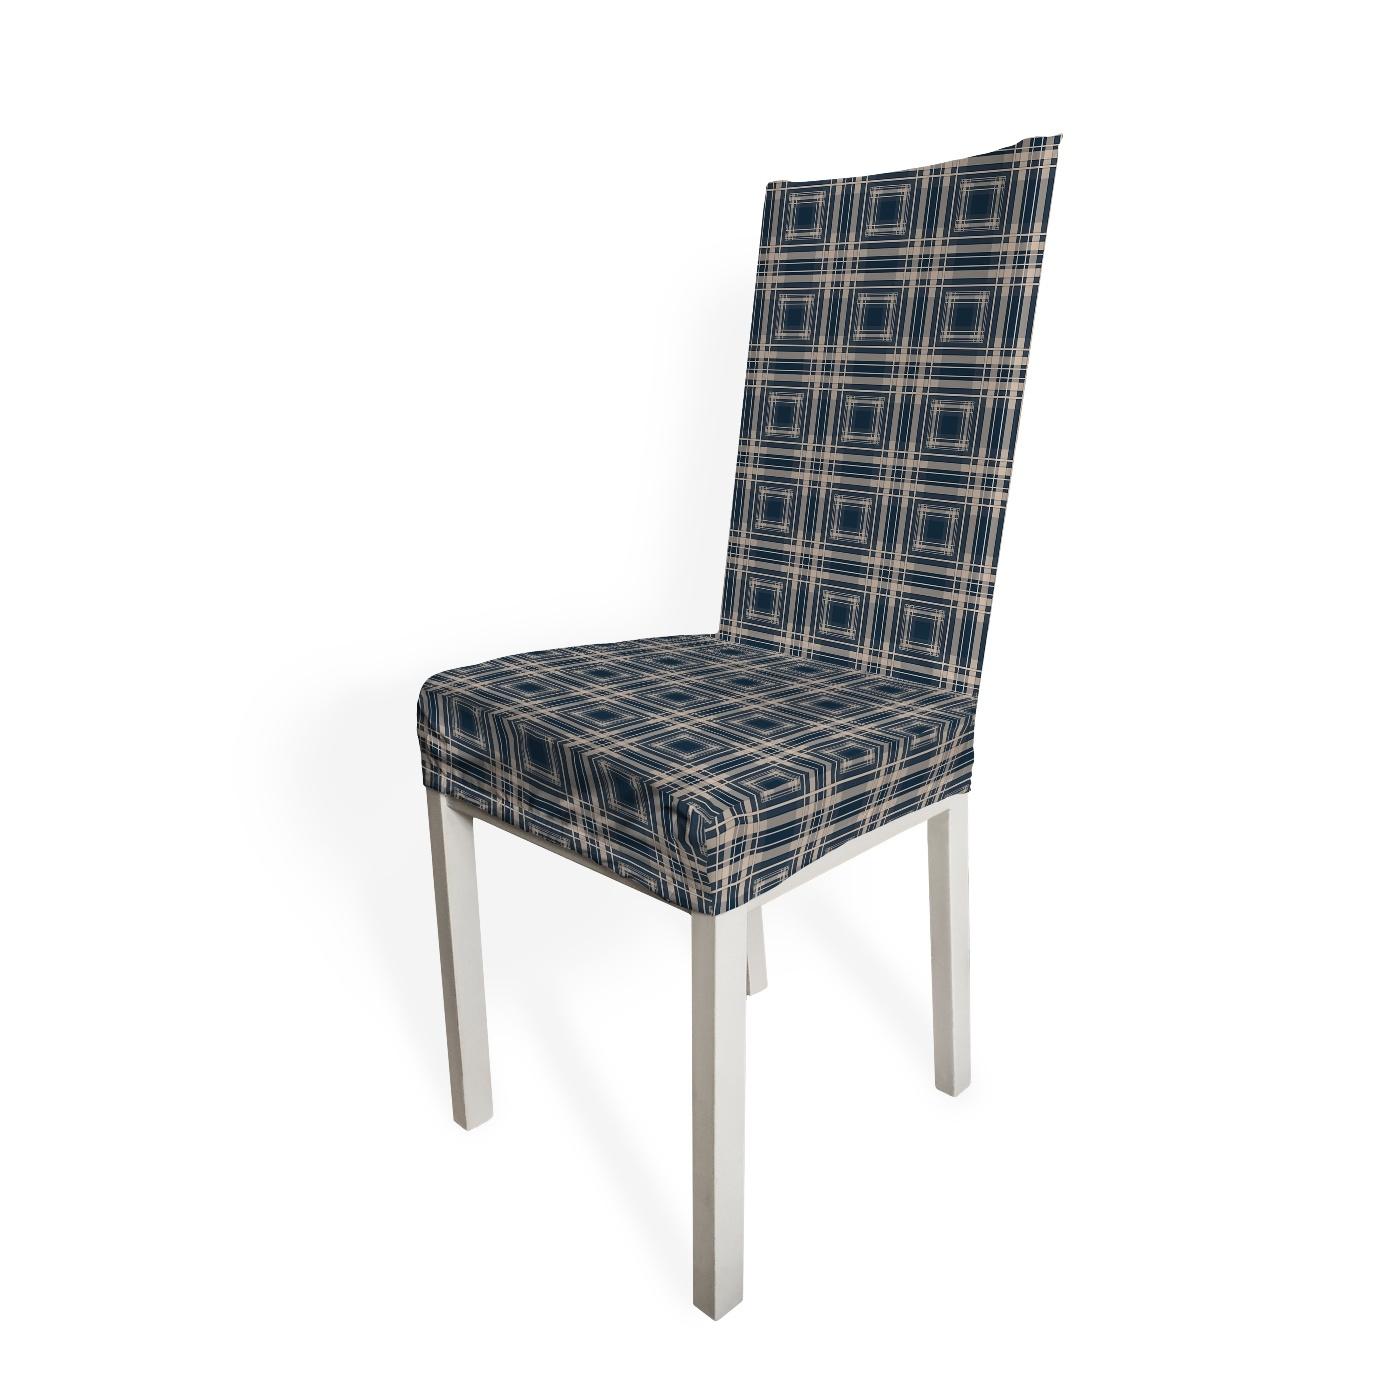 Чехол на стул Синяя с золотом sfer.tex